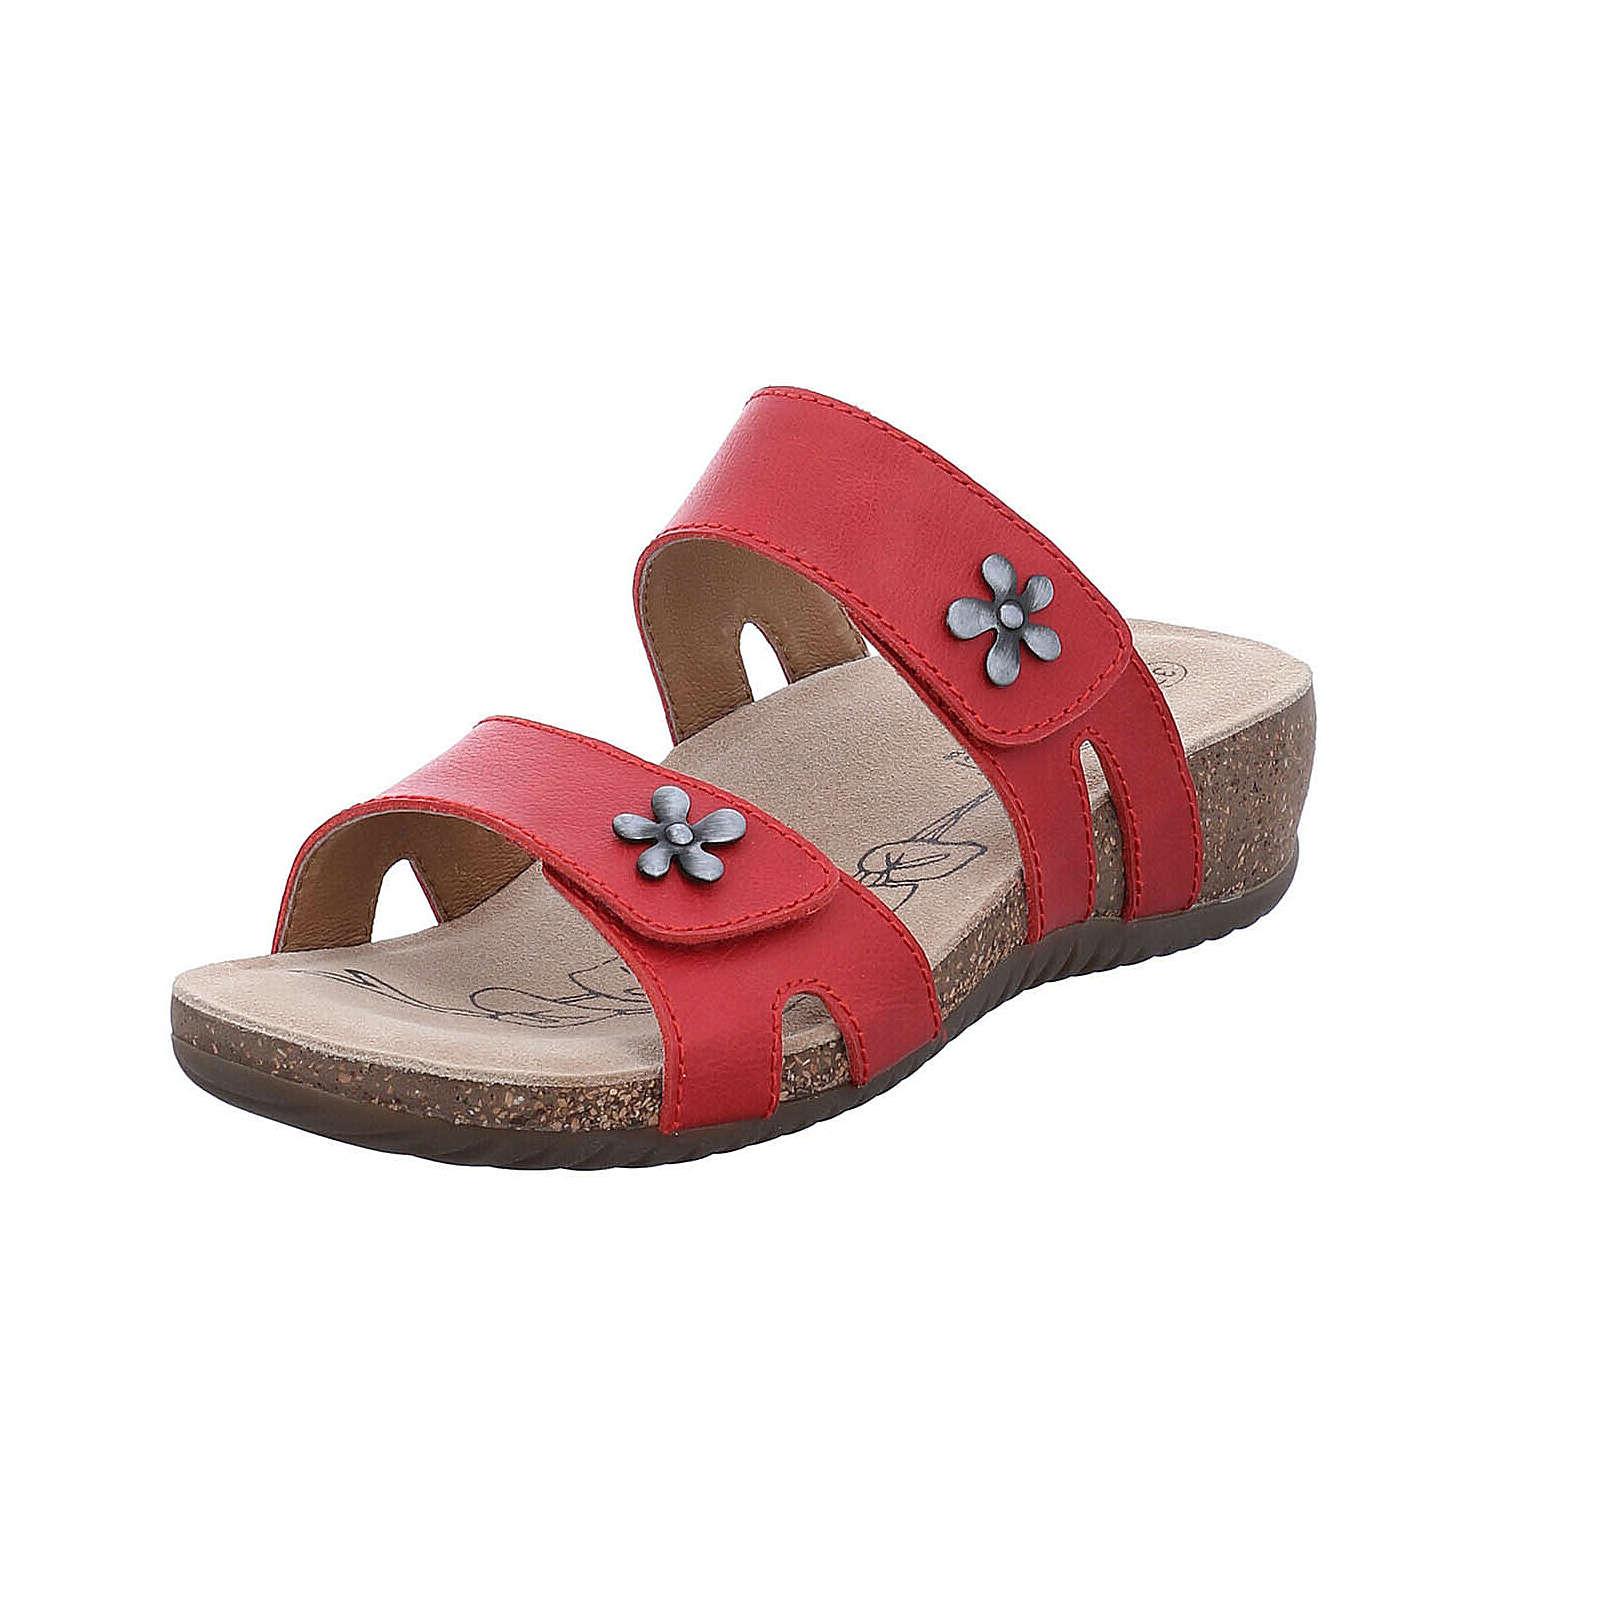 Josef Seibel Sandale Natalya 12 Klassische Sandalen rot Damen Gr. 39